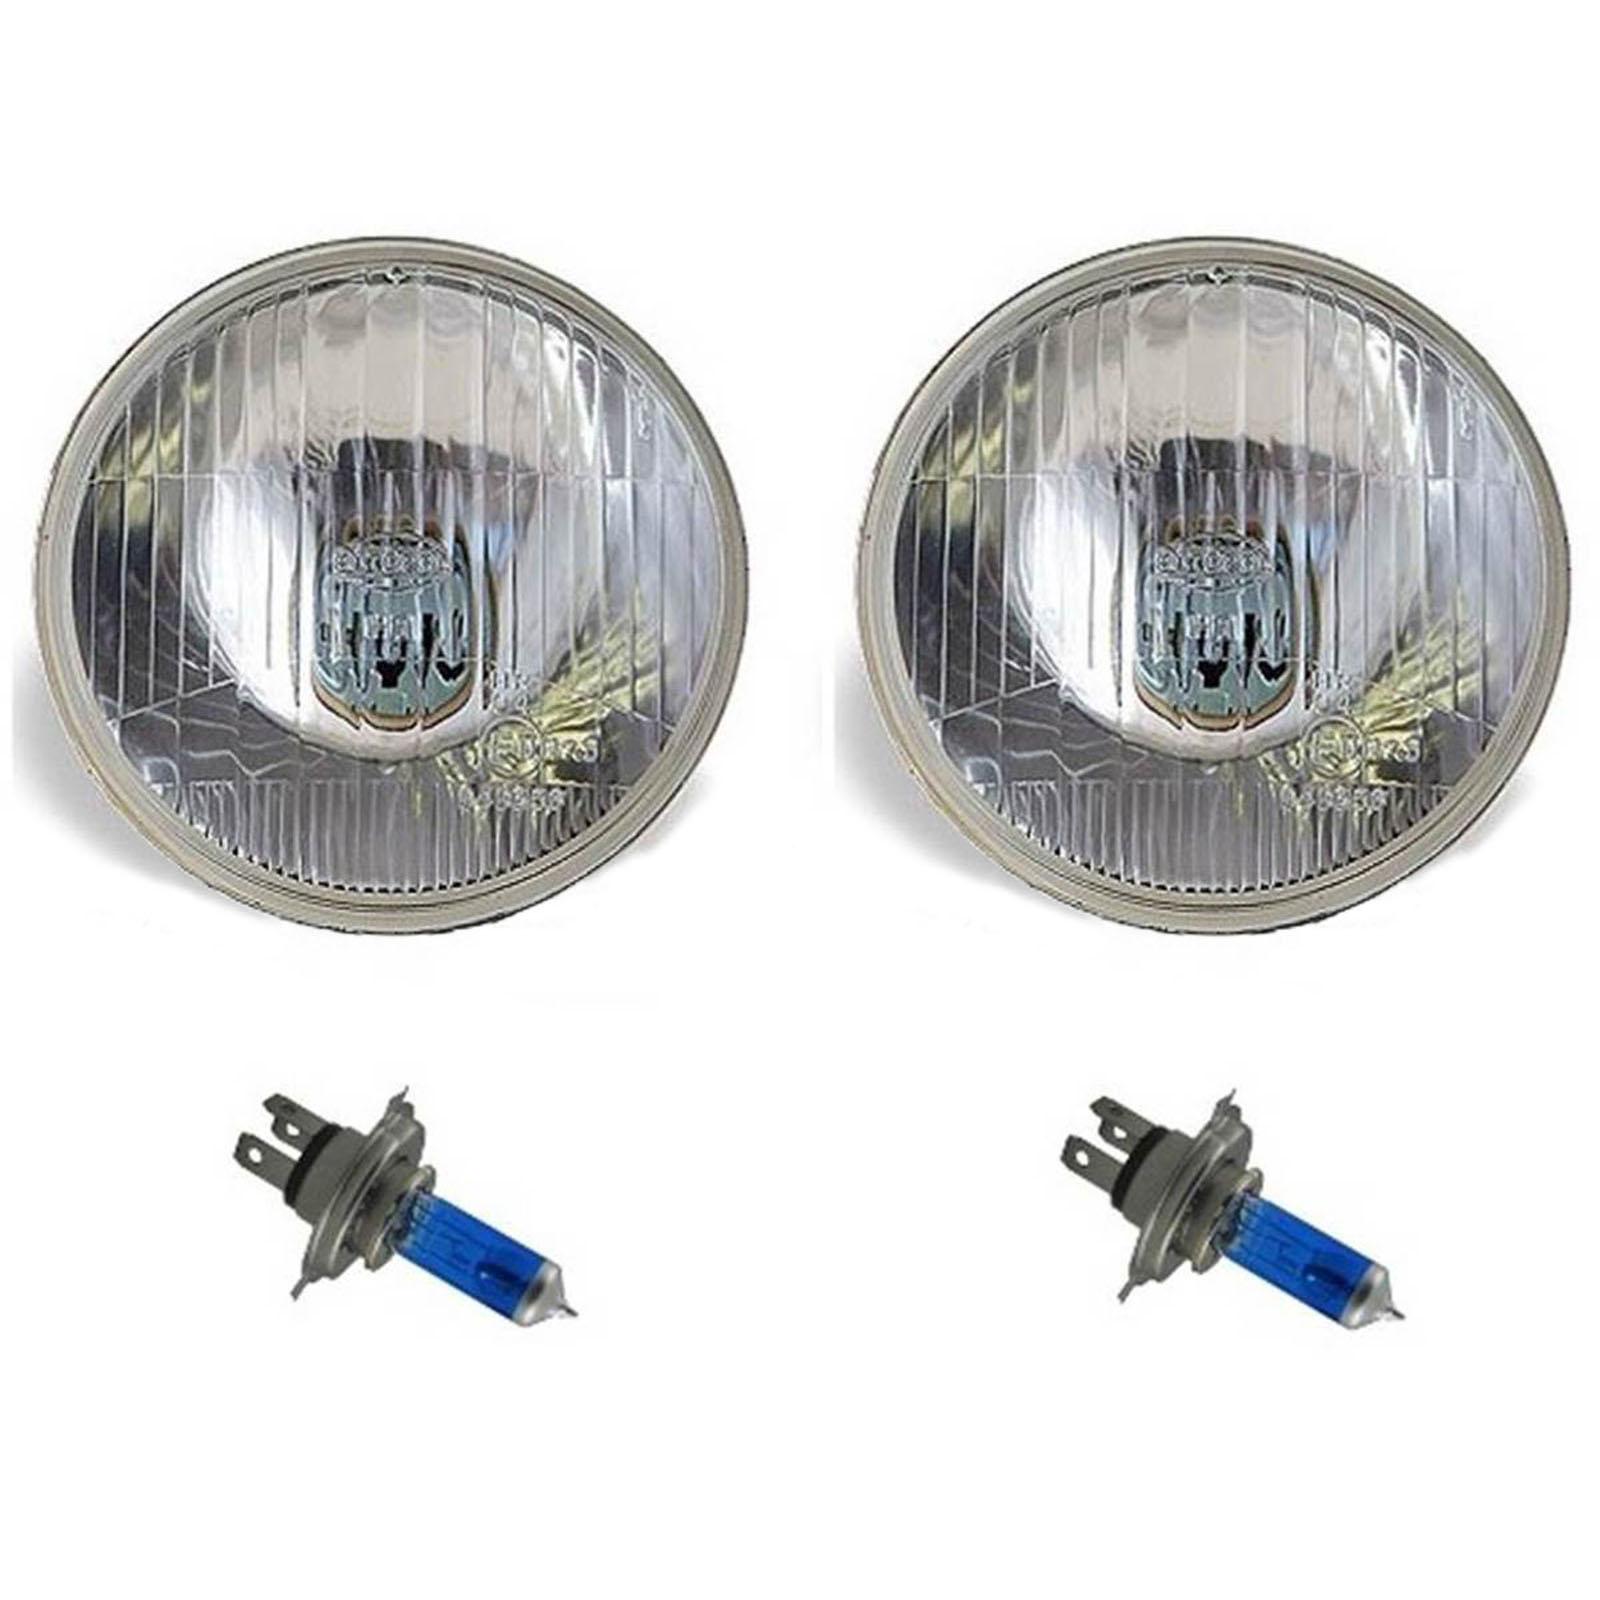 "7"" Halogen Semi Sealed Beam Stock Headlight Head Lamp Bulbs H4 100/90W Pair 3"